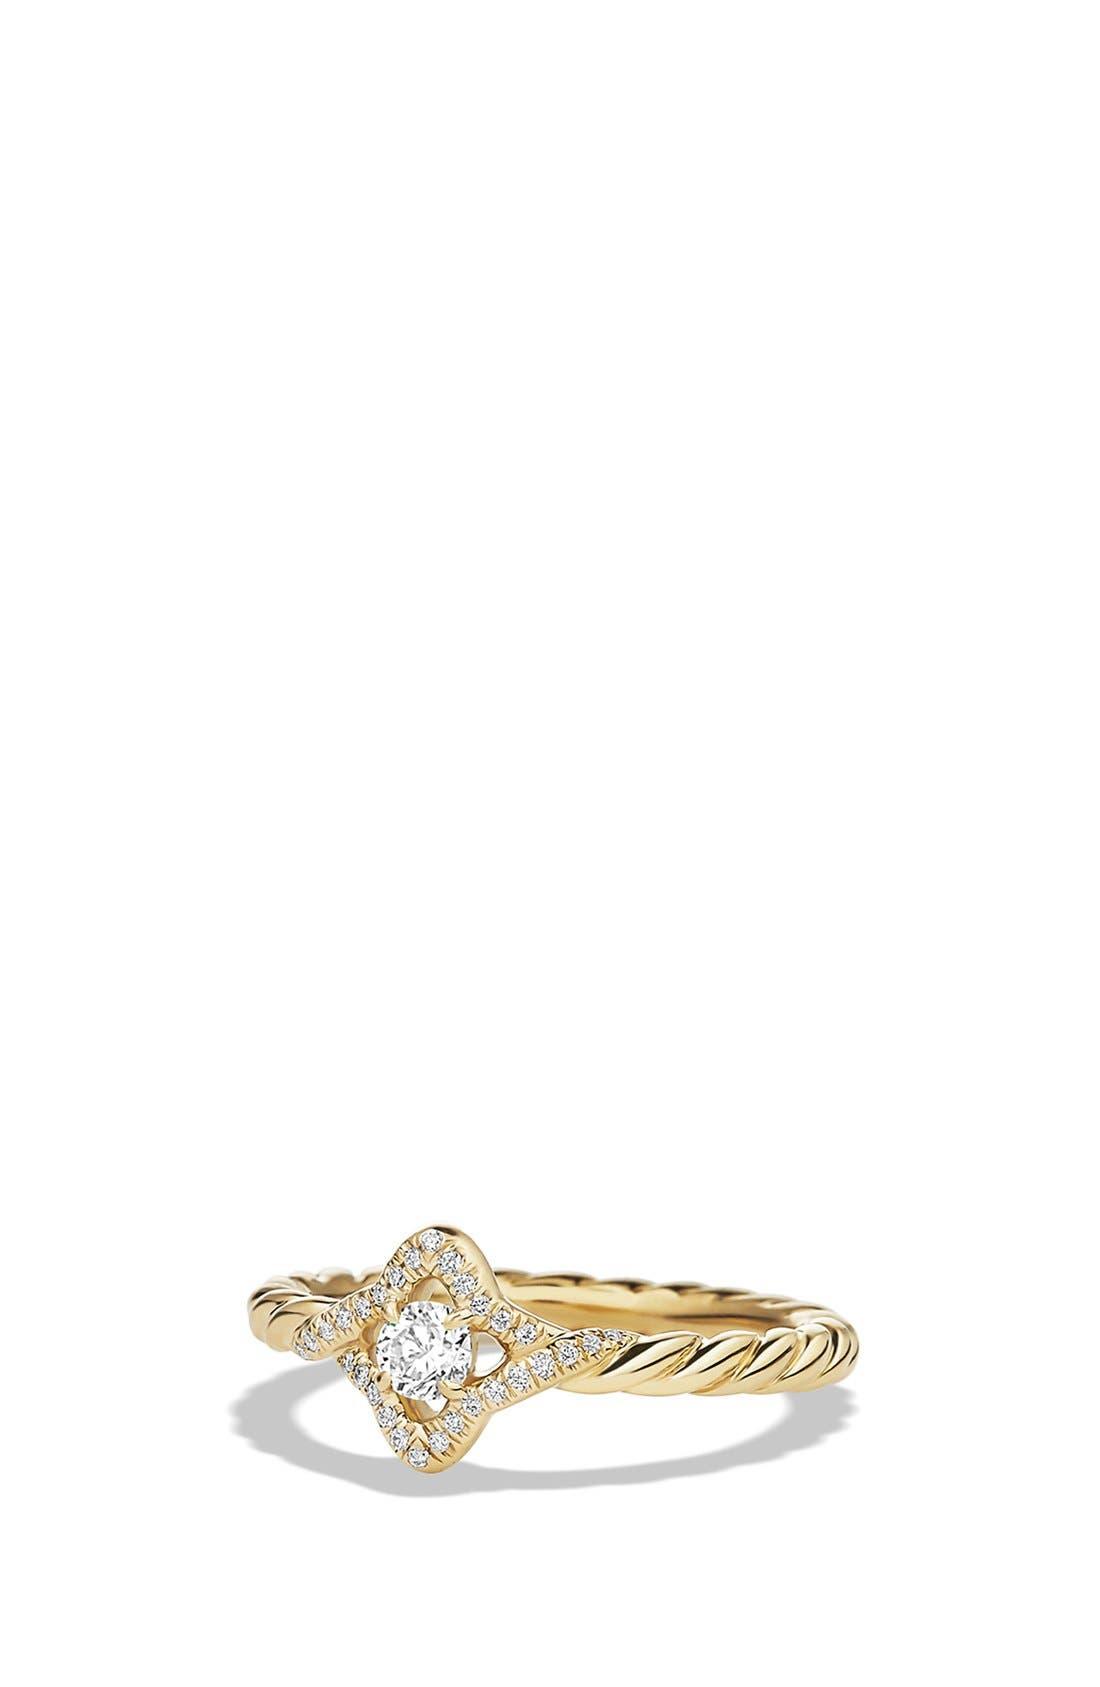 'Venetian Quatrefoil' Ring with Diamonds,                             Main thumbnail 1, color,                             YELLOW GOLD